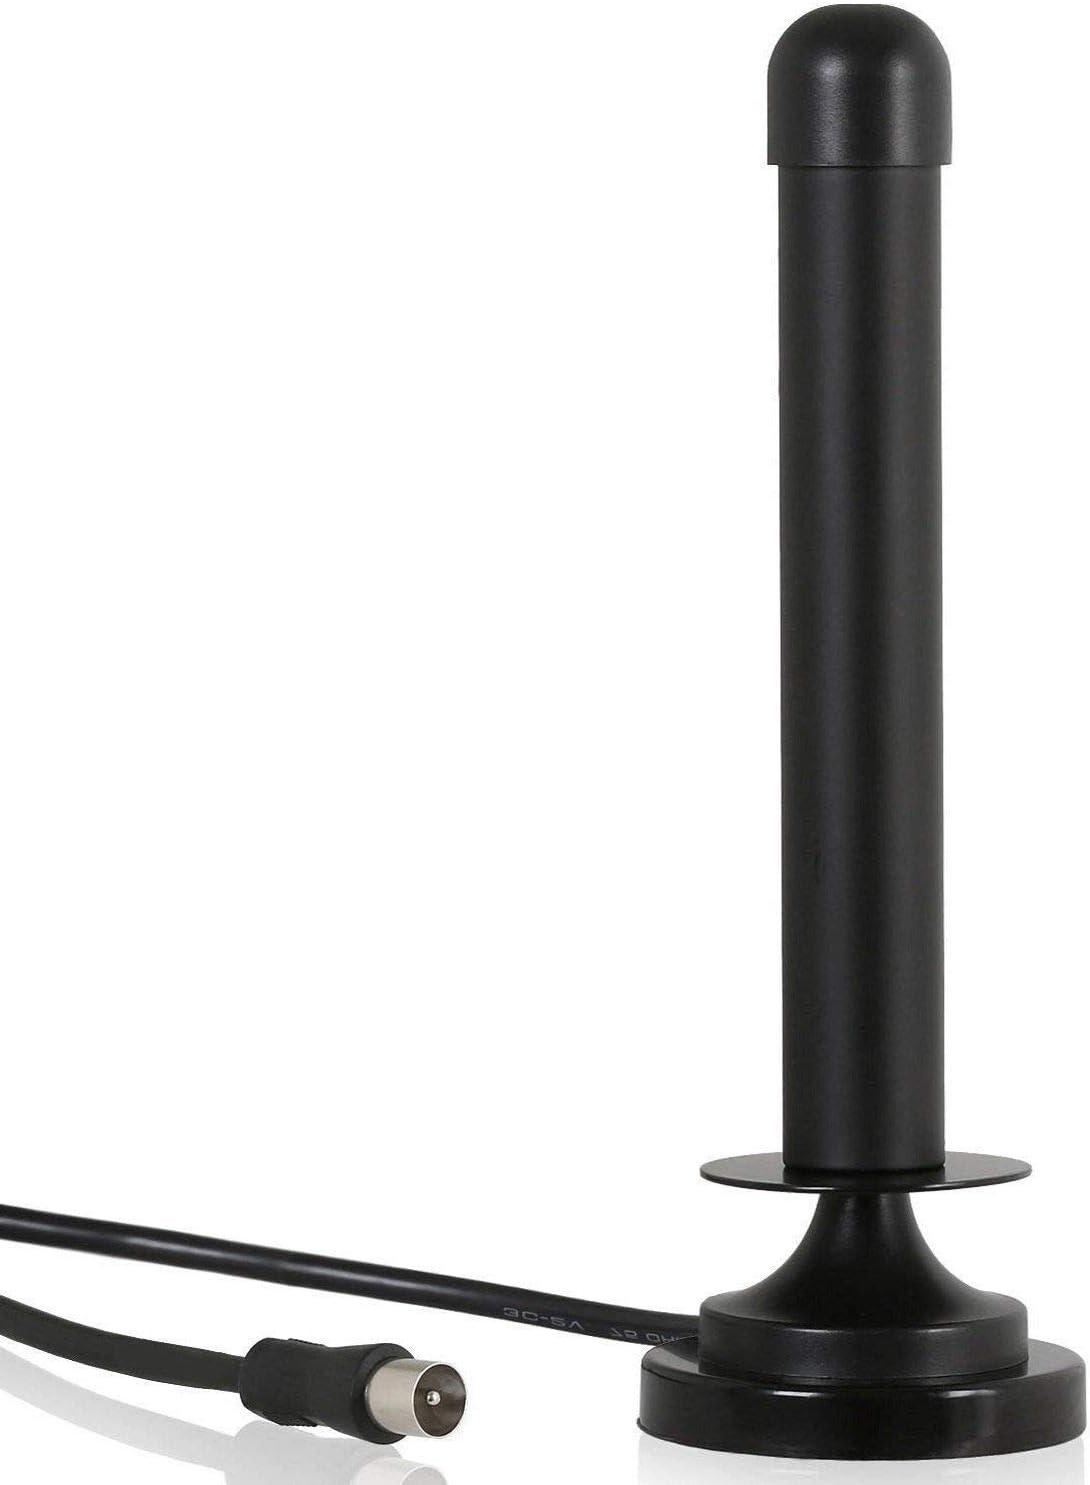 Wicked Chili Dvbt2 Antenne Kompatibel Mit Samsung Elektronik